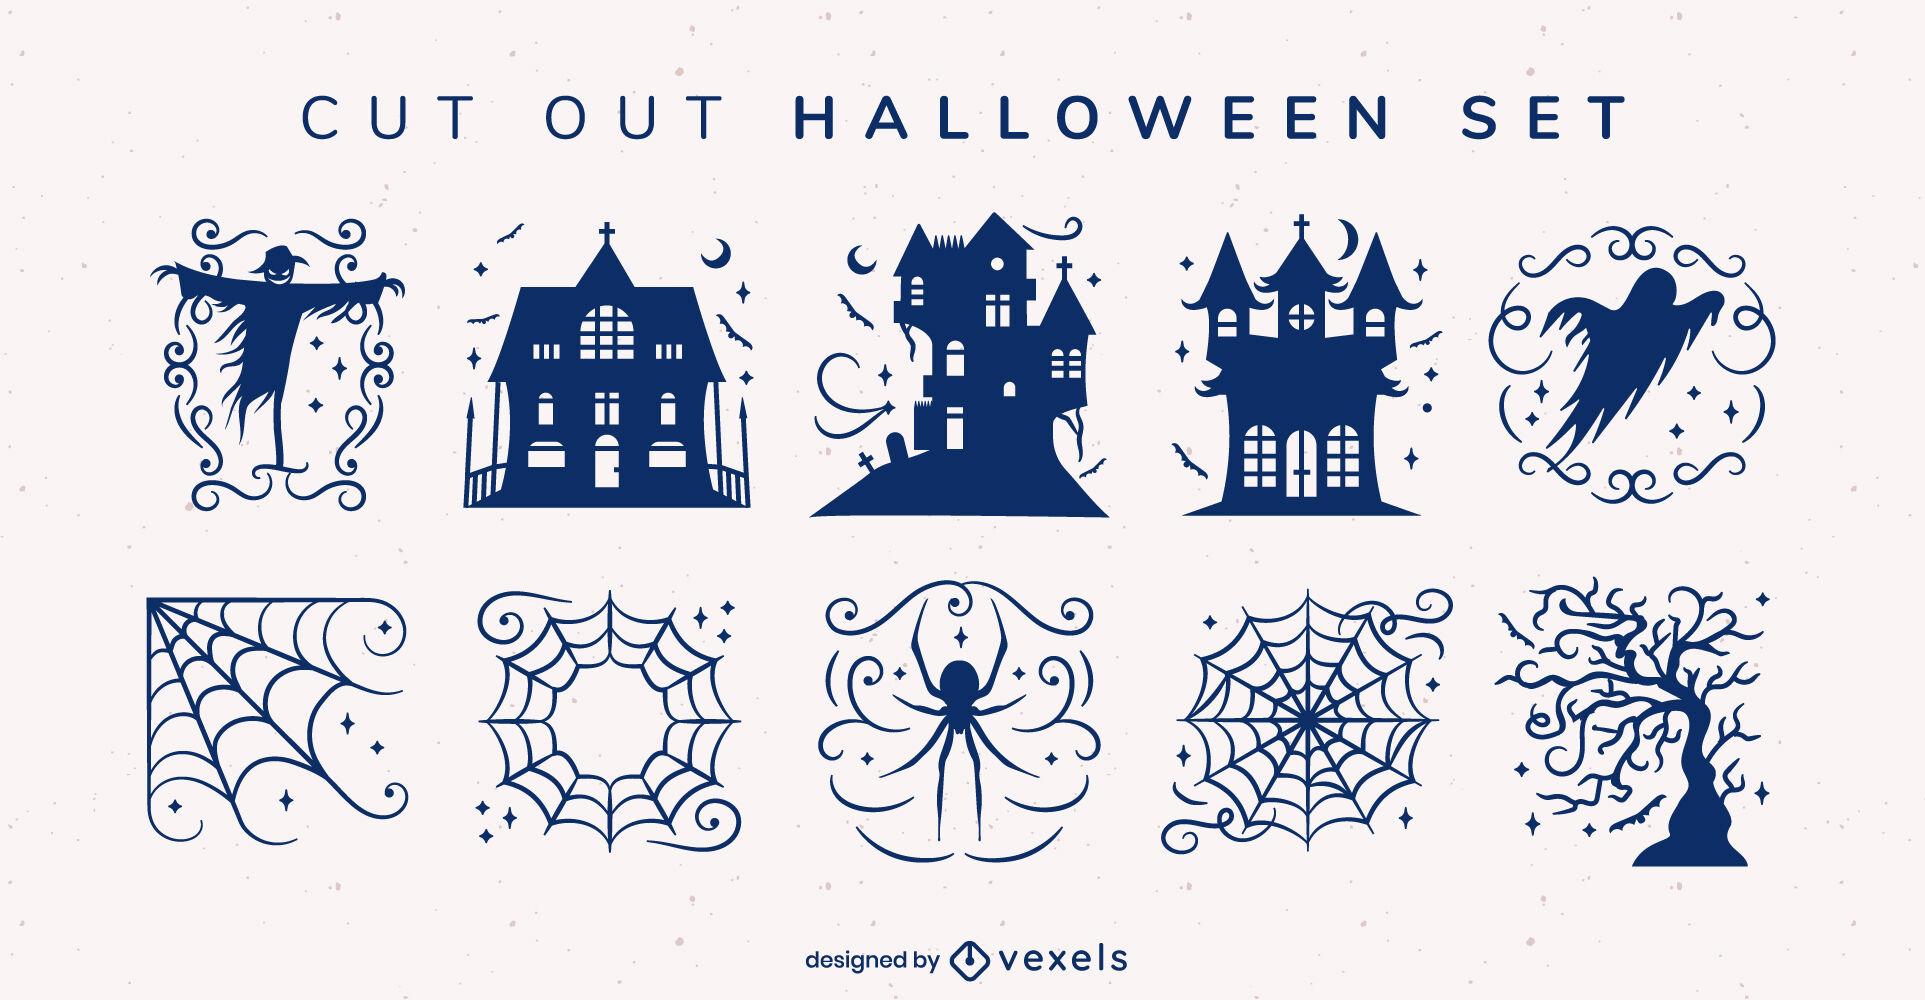 Halloween illustrations set design cut out